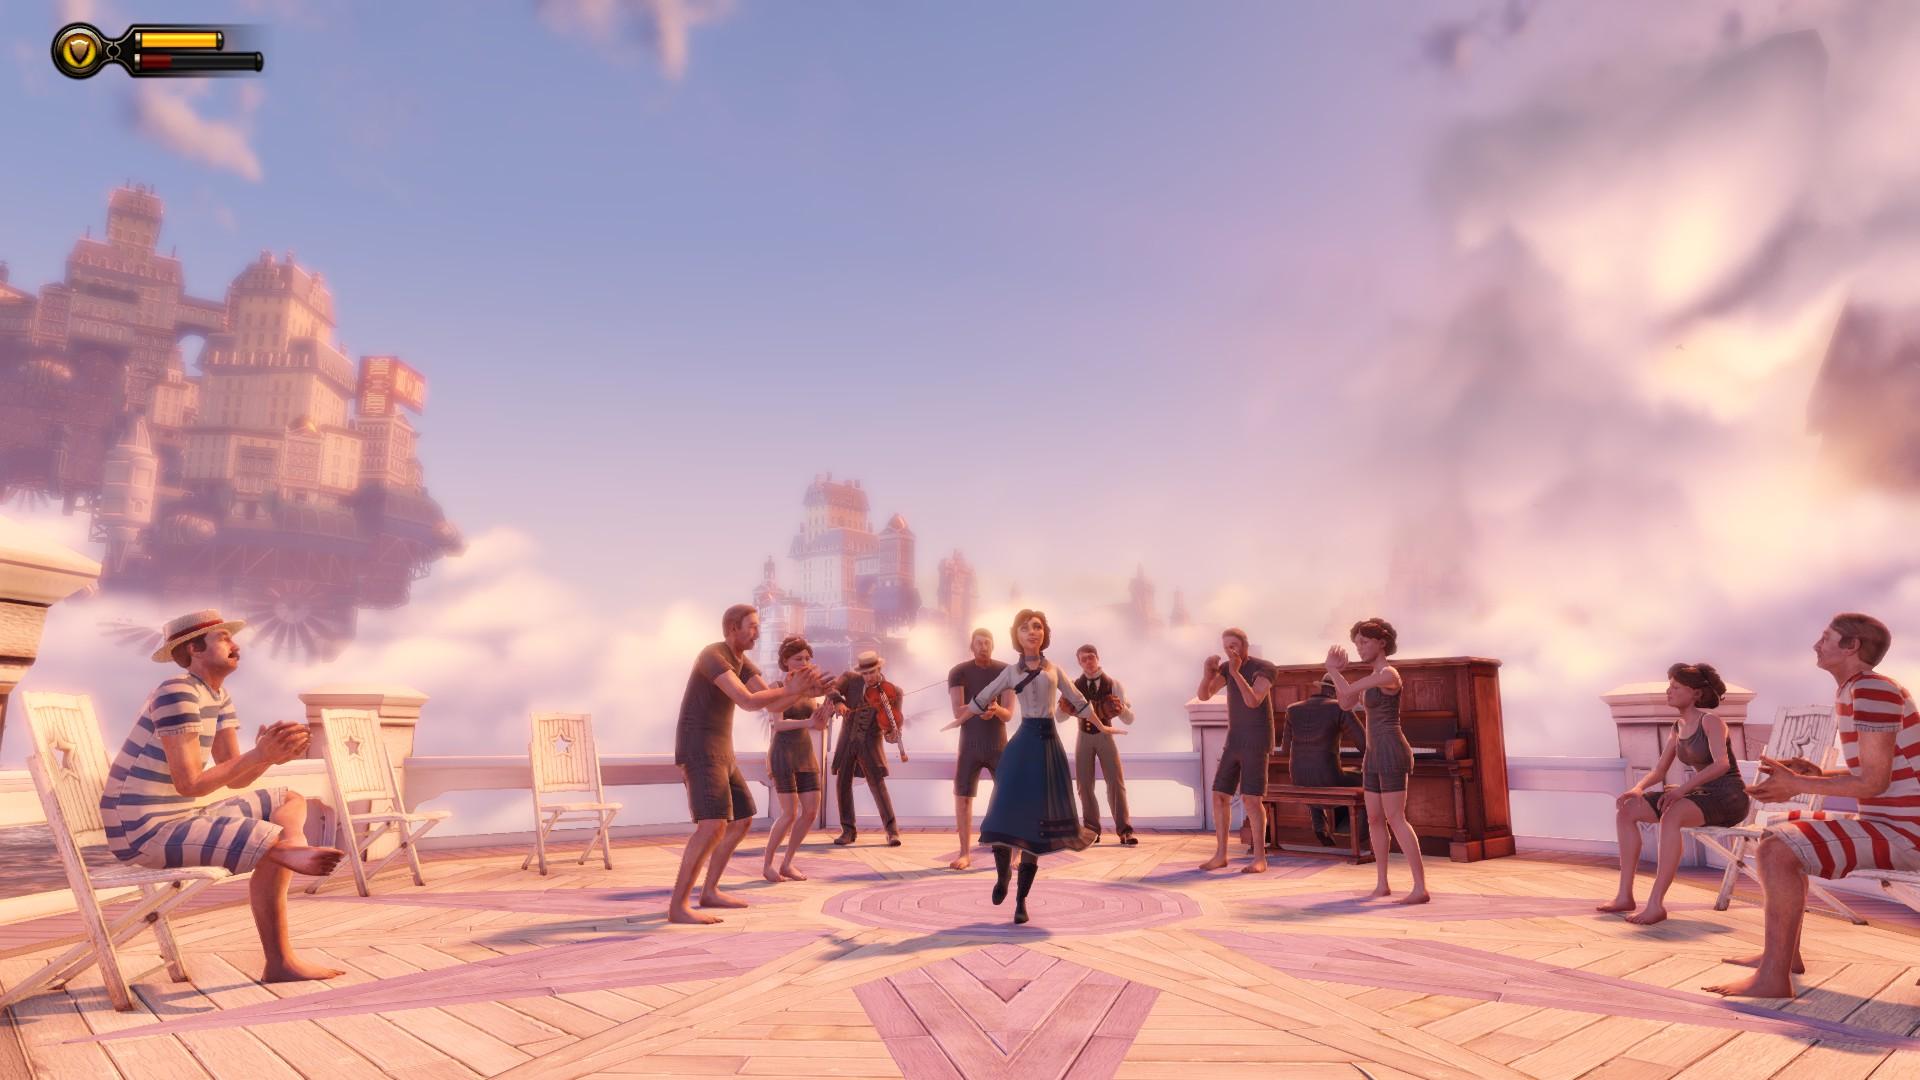 Welcome to the utopian microcosm of Battleship Bay ... or ...